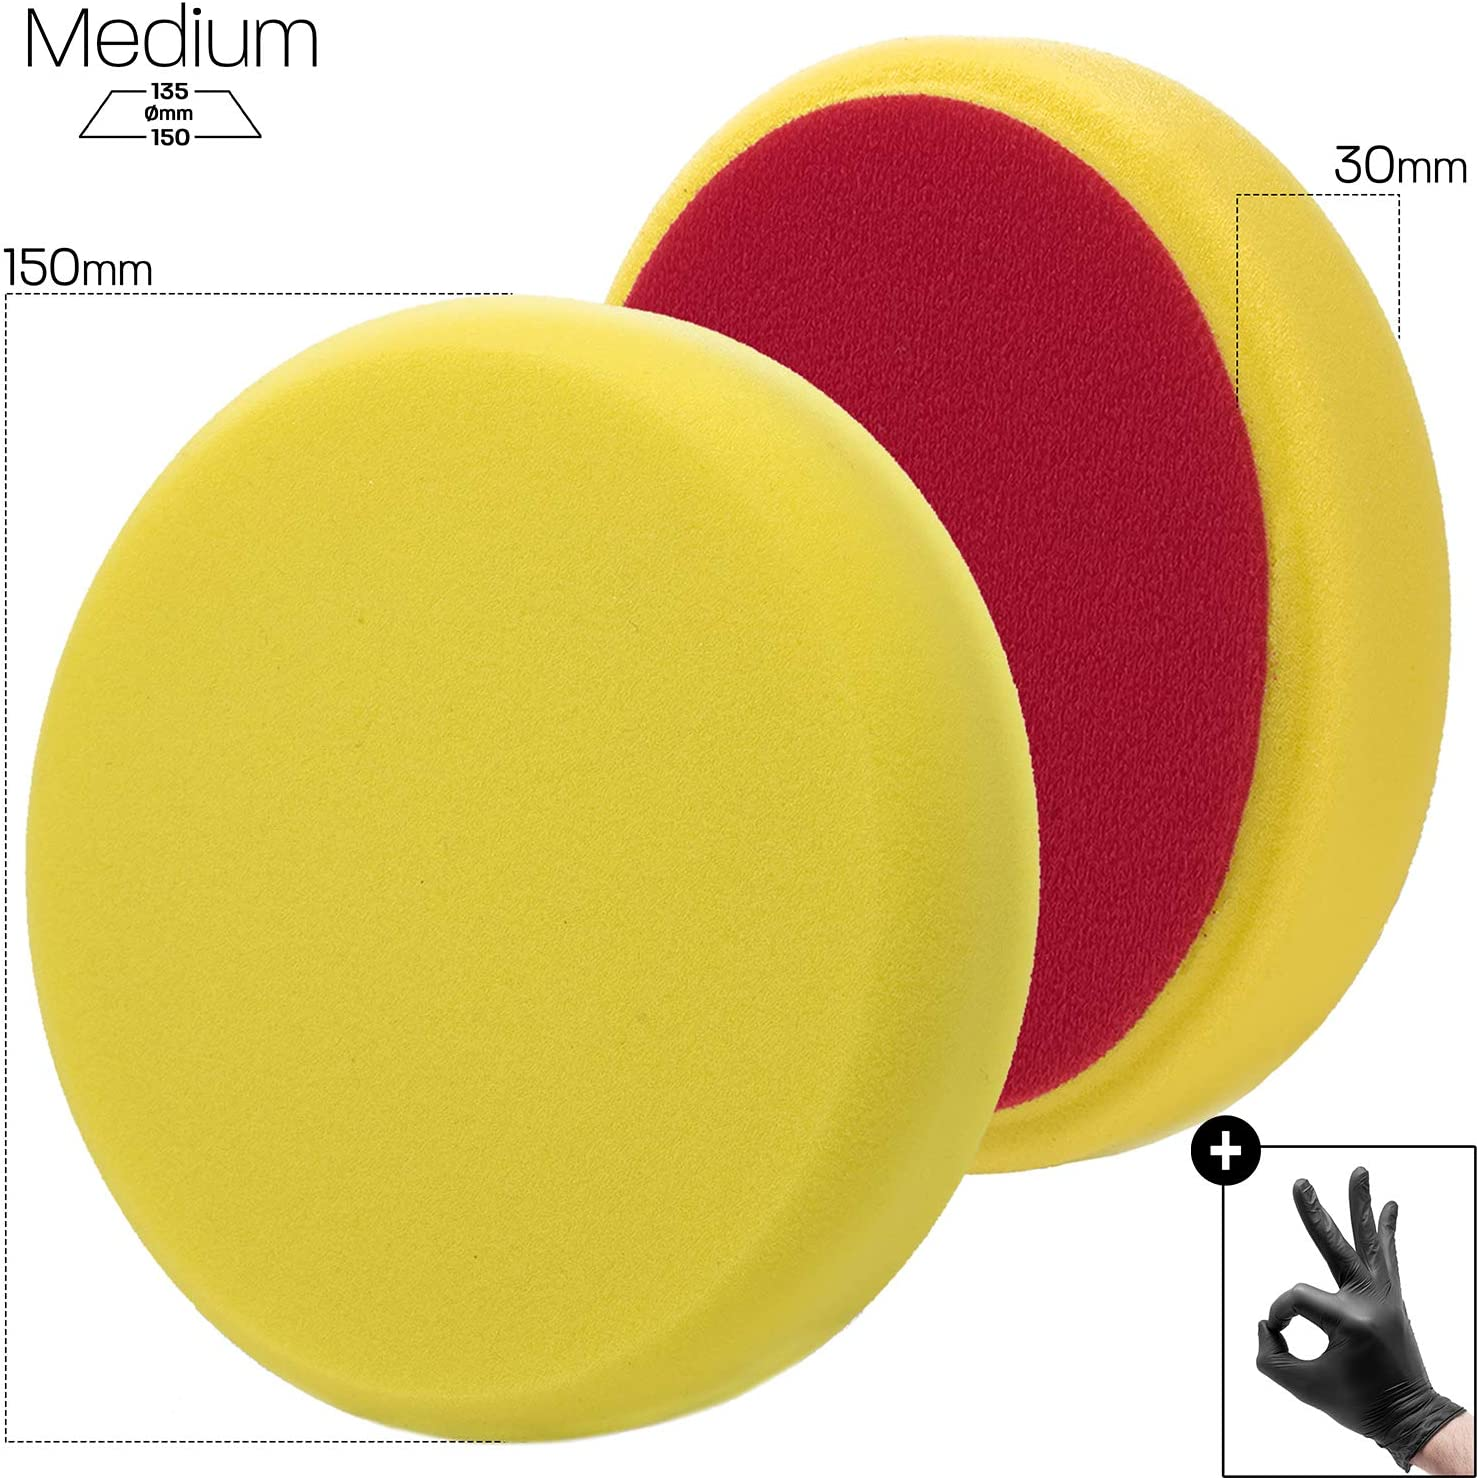 Detailmate Polierschwamm Menzerna Medium Cut Pad Standart Gelb 150 Mm P150m Polieren 1 Schutzhandschuh Auto